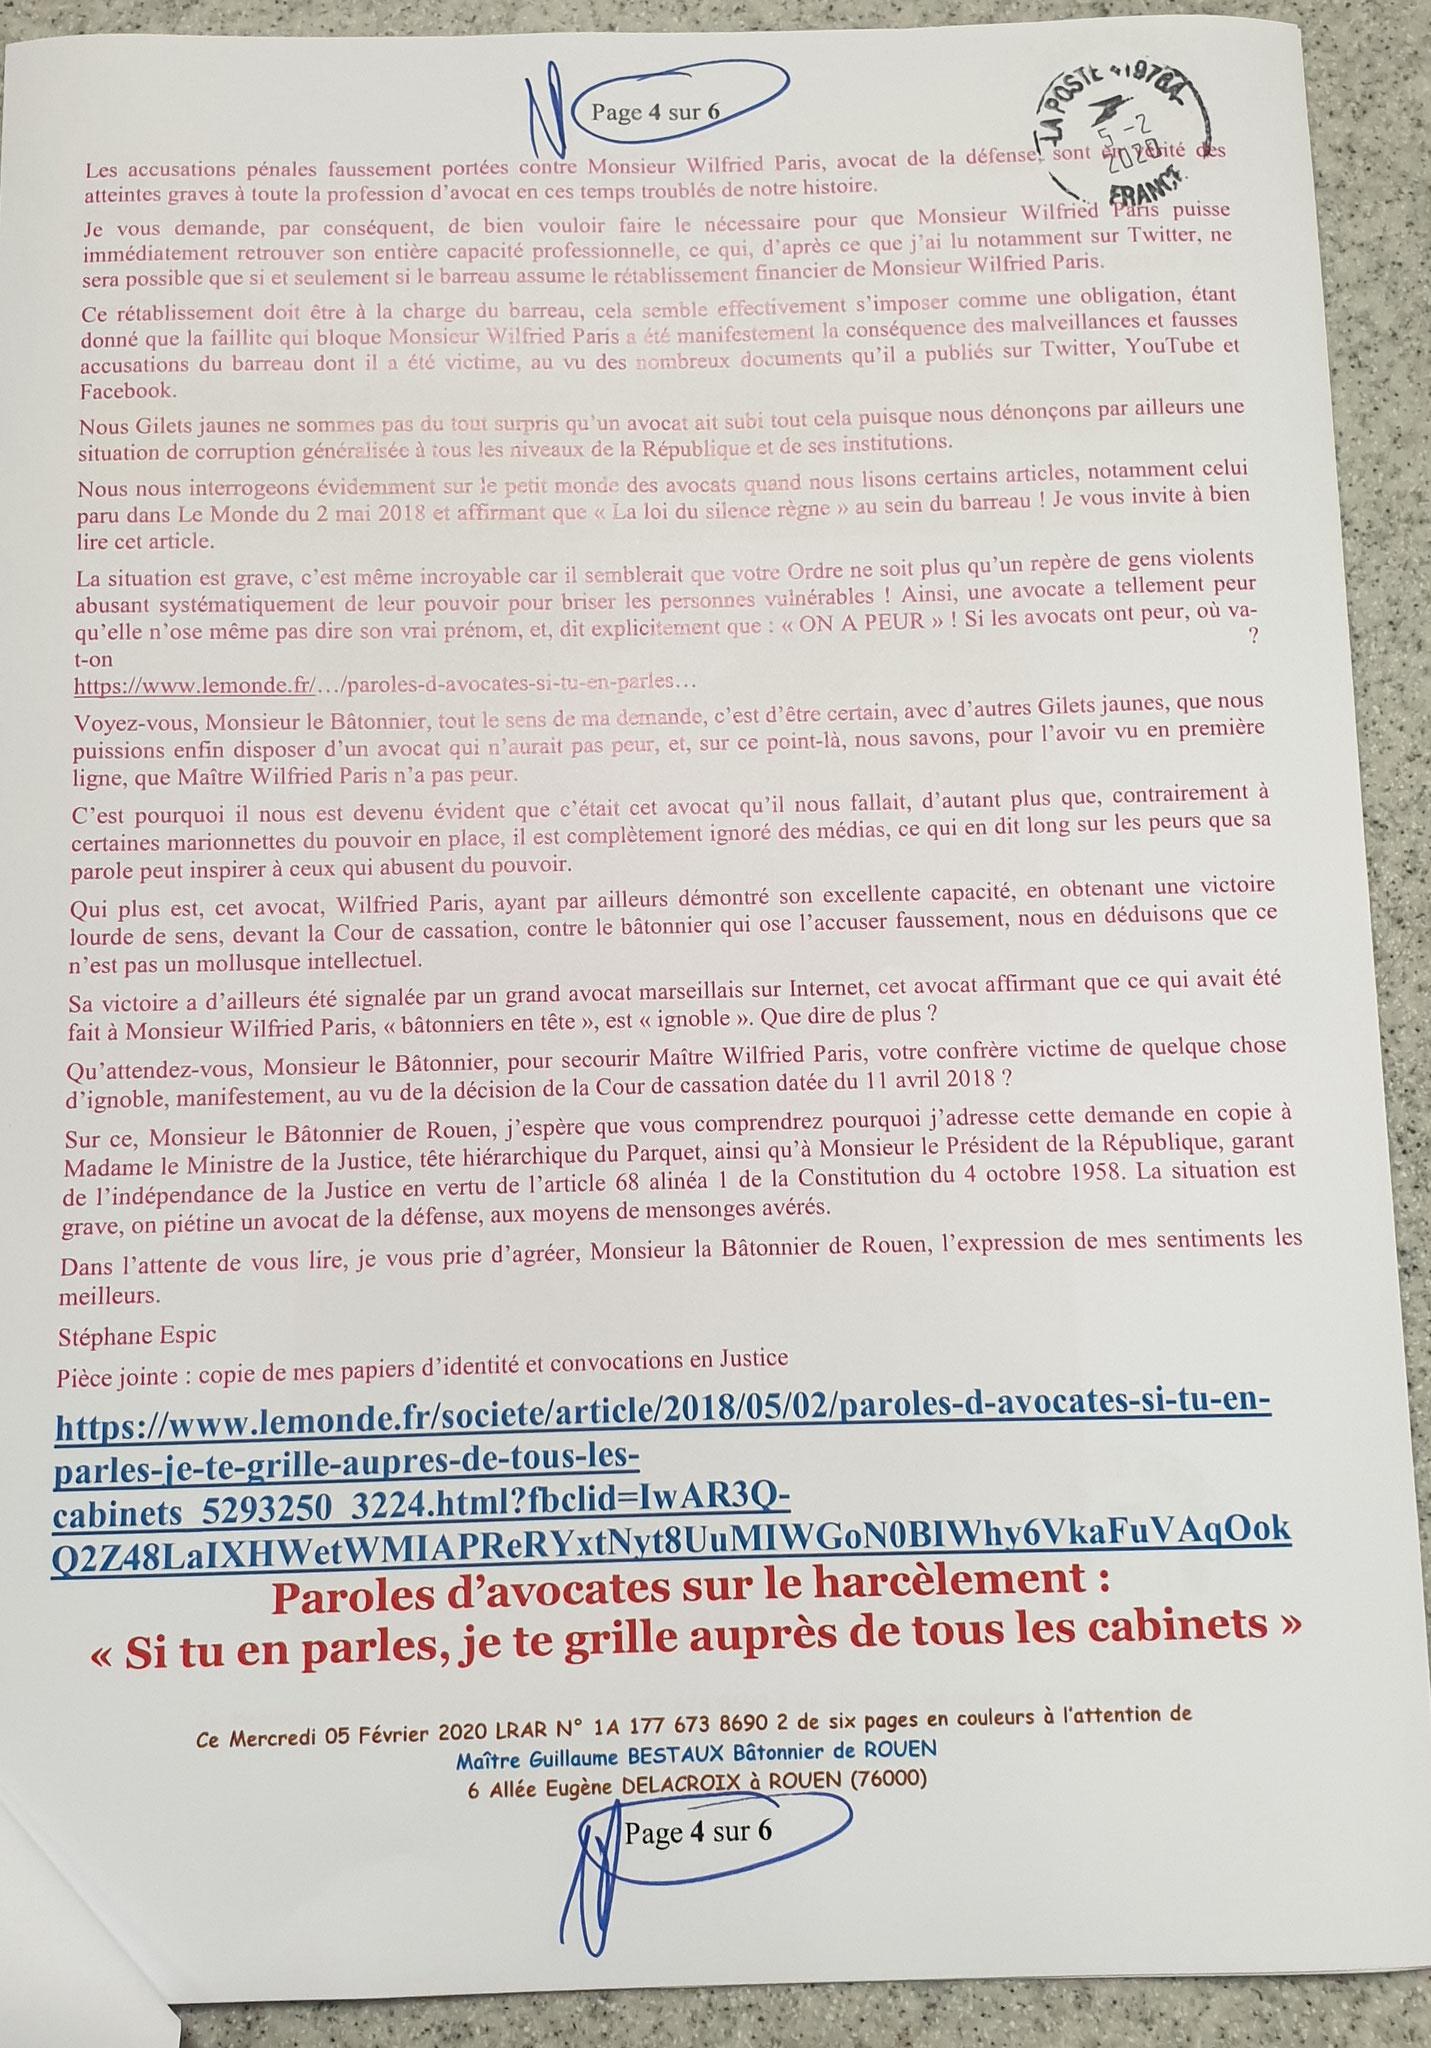 Ma lettre recommandée du 05 Février 2020 N° 1A 177 673 8690 2 Page 4 sur 6 en couleurs www.jesuispatrick.fr www.jesuisvictime.fr www.alerte-rouge-france.fr